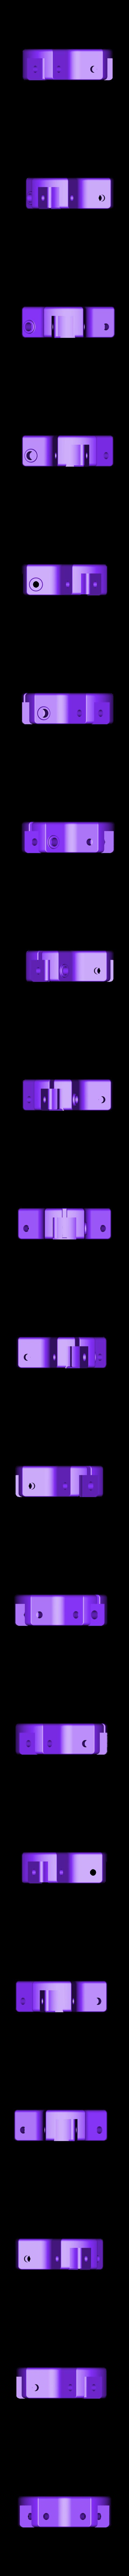 Top_Treeangle.STL Download free STL file Tripod GIANT width Masked SLA 3D Printing Technology • 3D print model, perinski